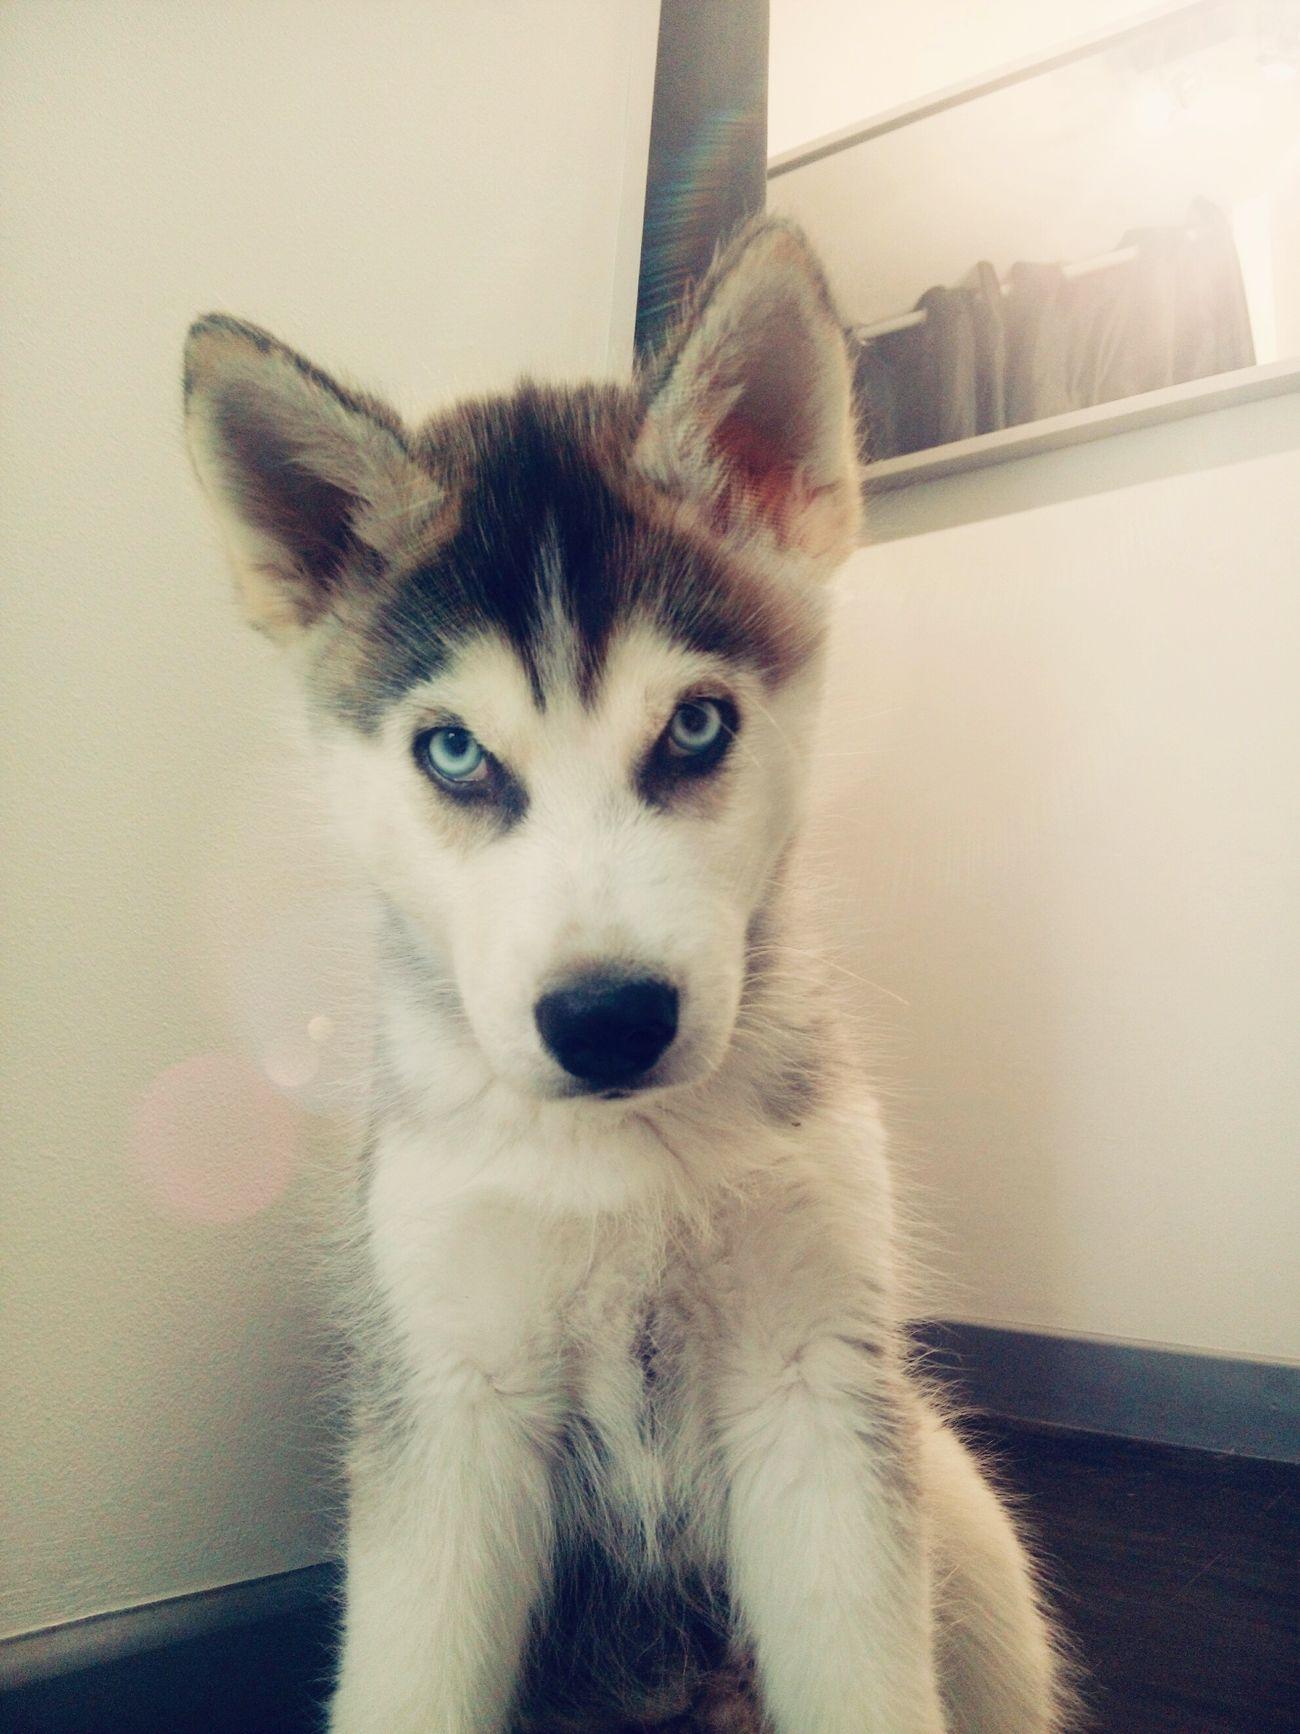 Siberian Husky Husky Puppy Husky Thug Life Eyeblue